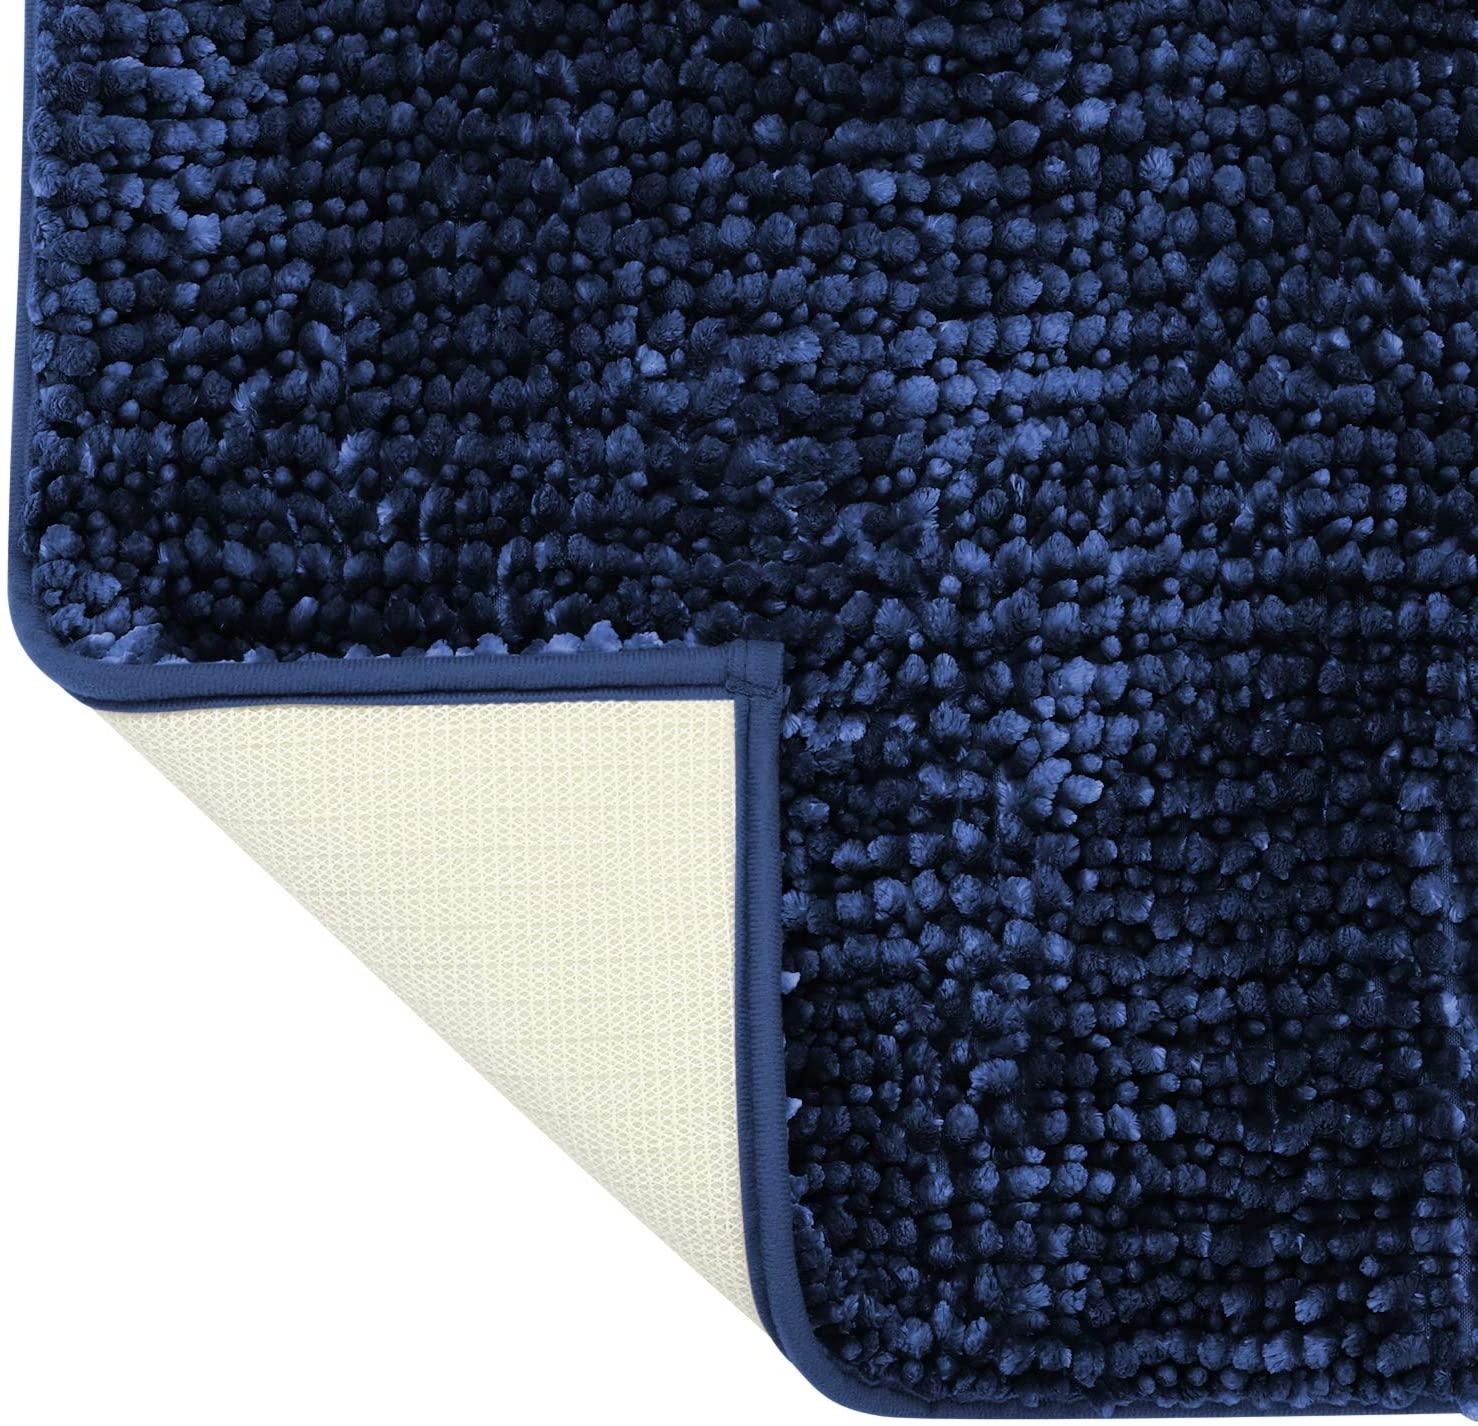 HOMEIDEAS Luxurious U-Shaped Contour Mat - Chenille Navy Blue Bathroom Rug Mat Butter Absorbent Non Slip - Extra Soft Shag Bath Rug, Bath Mat for Tub, Shower & Bathroom - 20x24 inch